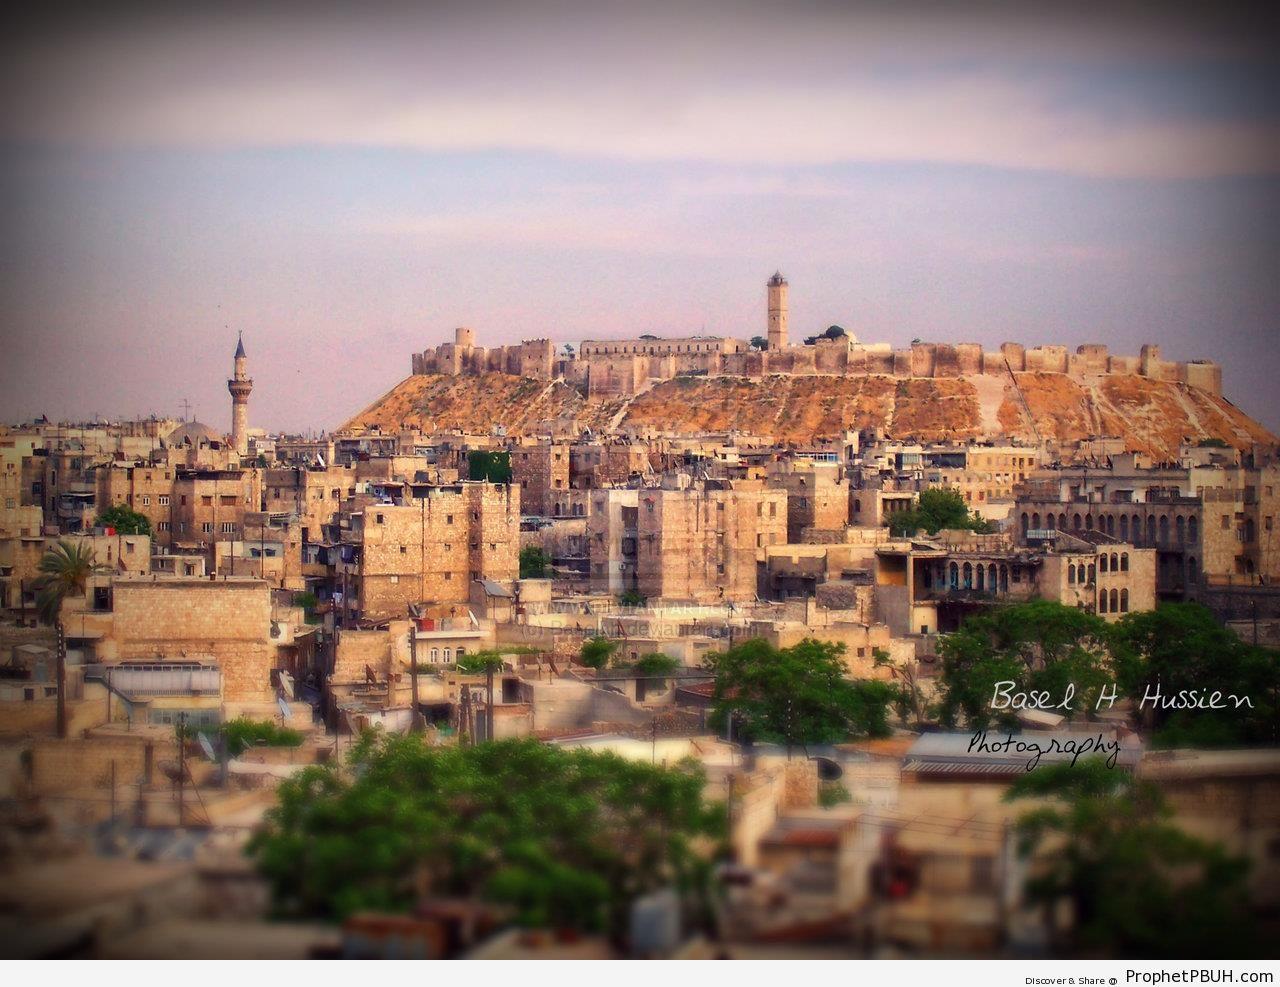 Al-Uthmaniyyah Mosque and Aleppo Citadel (Old City Aleppo, Syria) - Al-Uthmaniyah Mosque and Madrasa in Aleppo, Syria -Picture